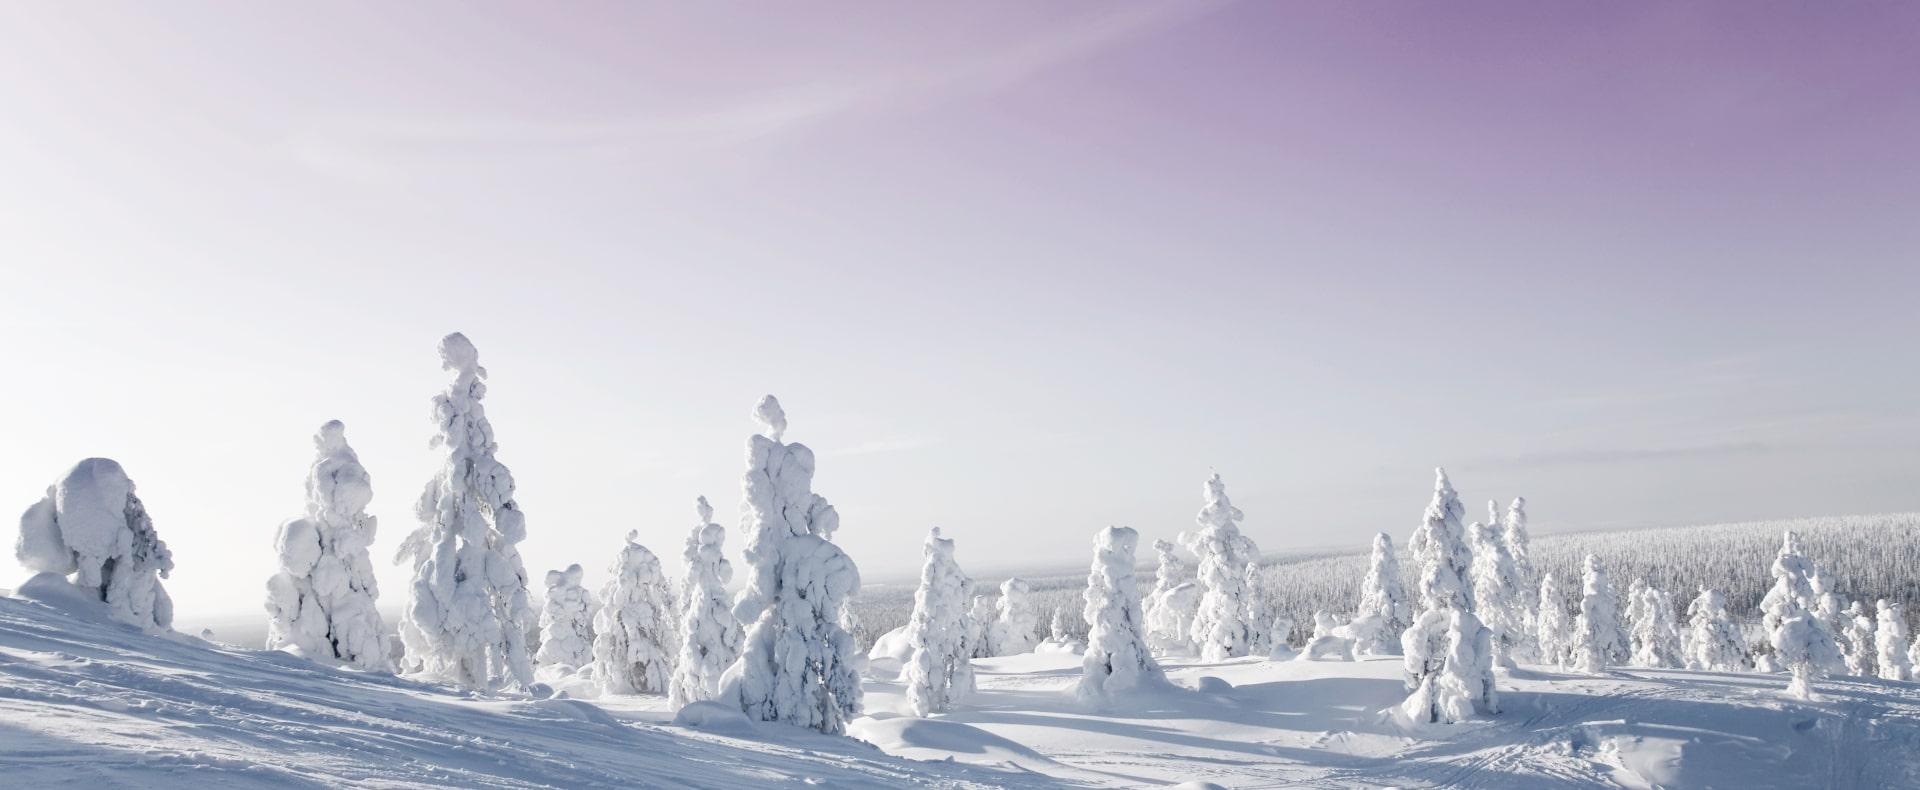 Lapland Region, Finland